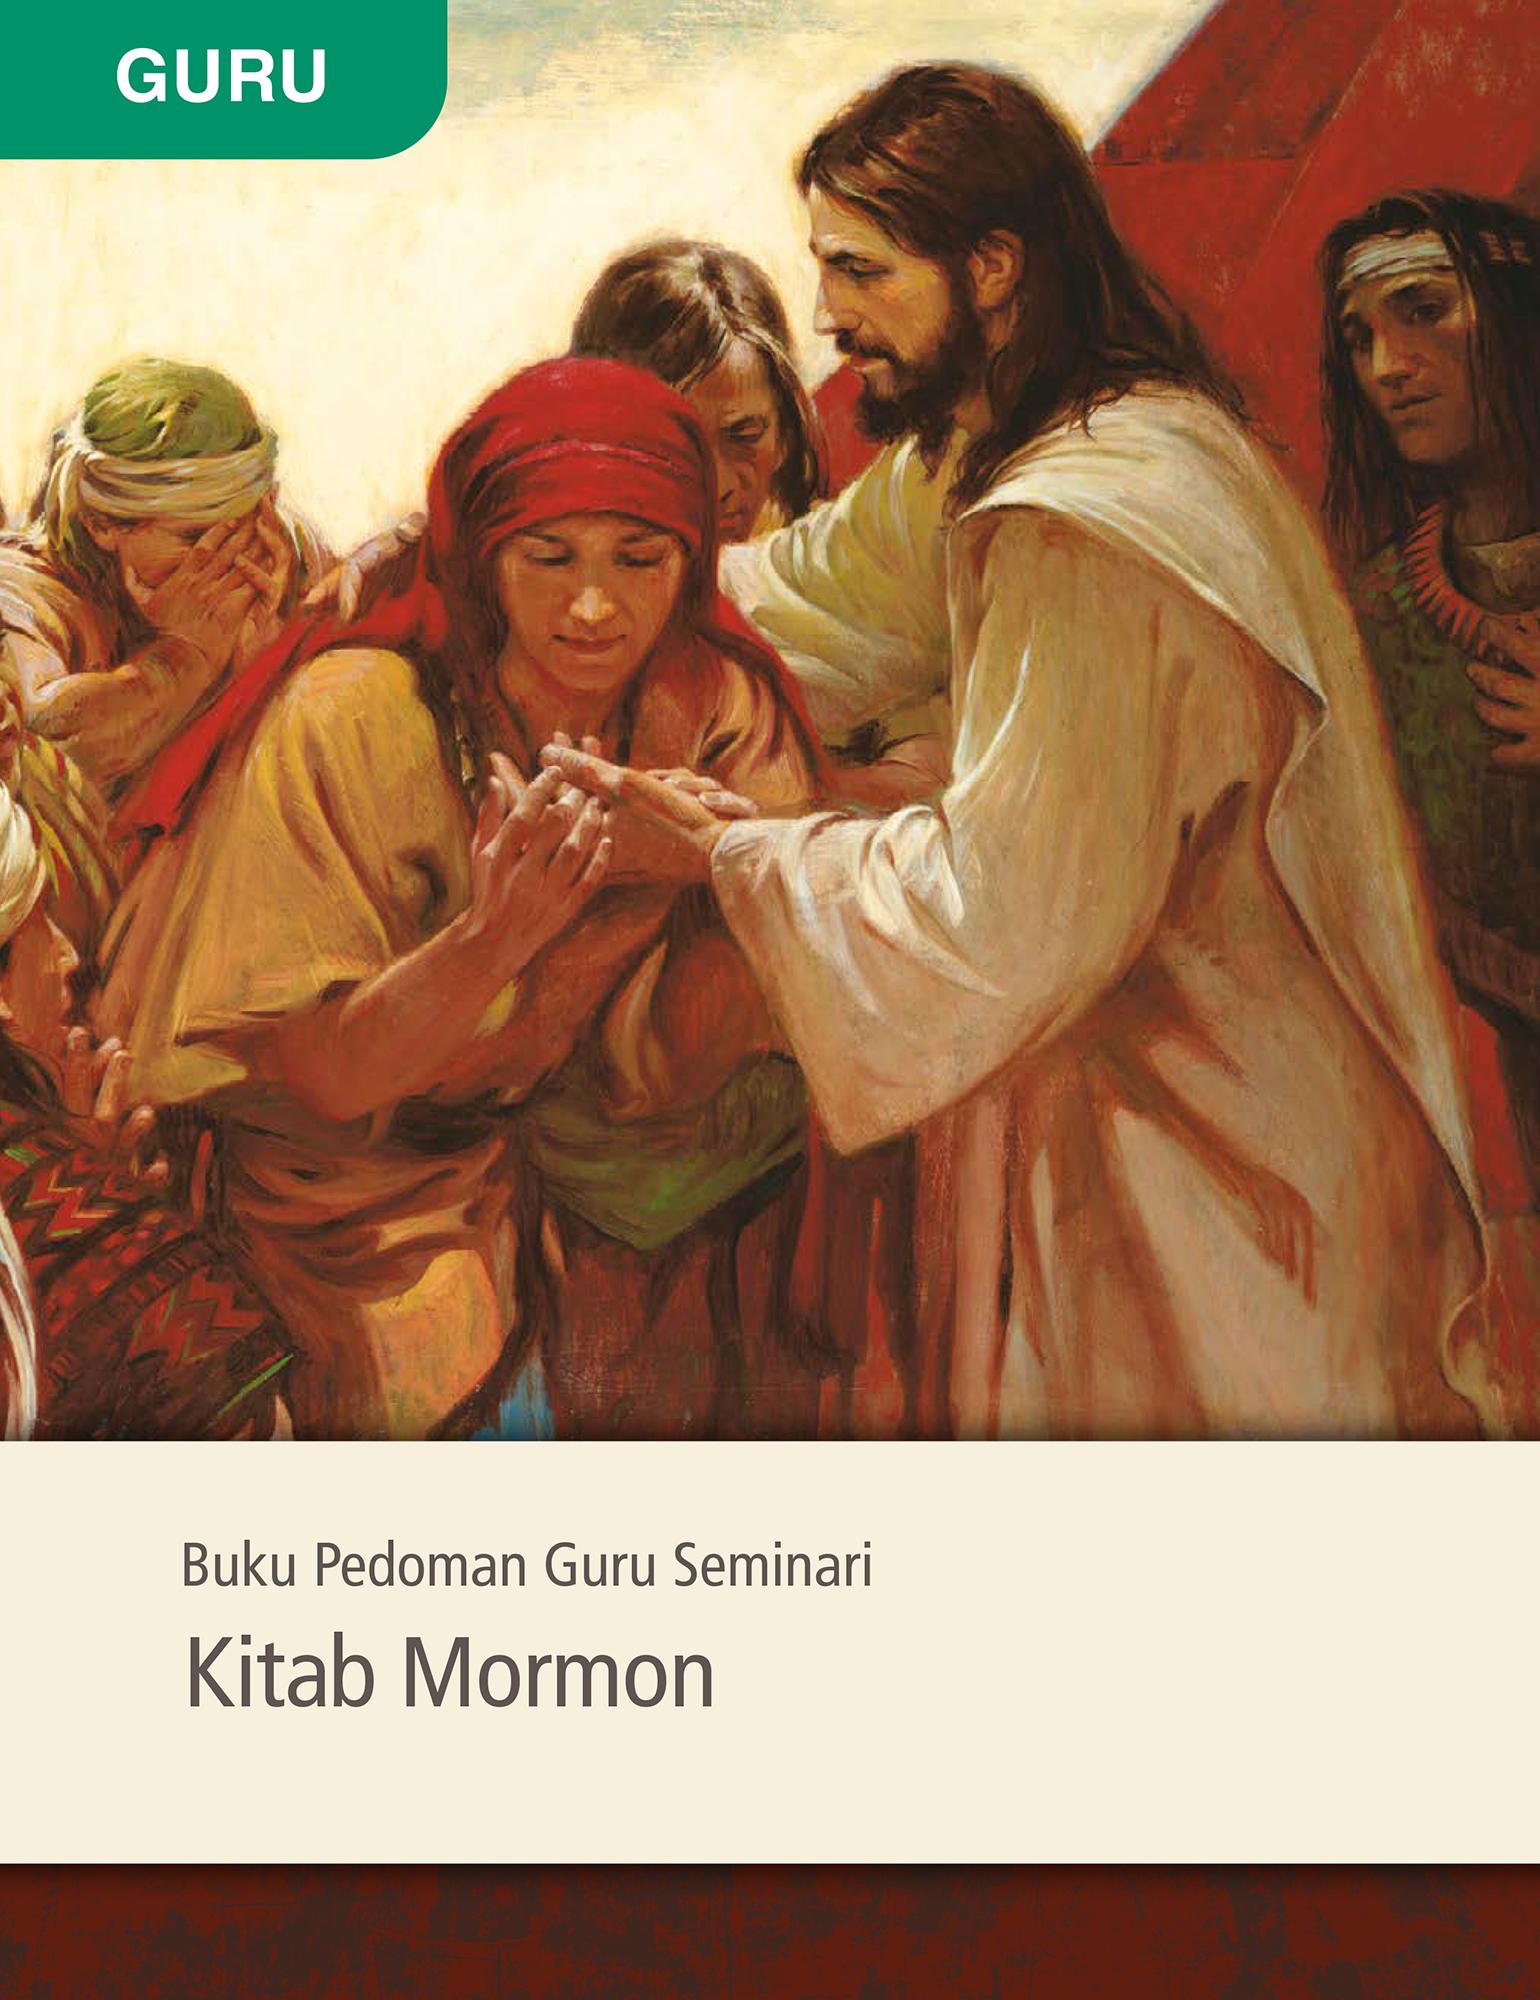 Buku Pedoman Guru Seminari Kitab Mormon